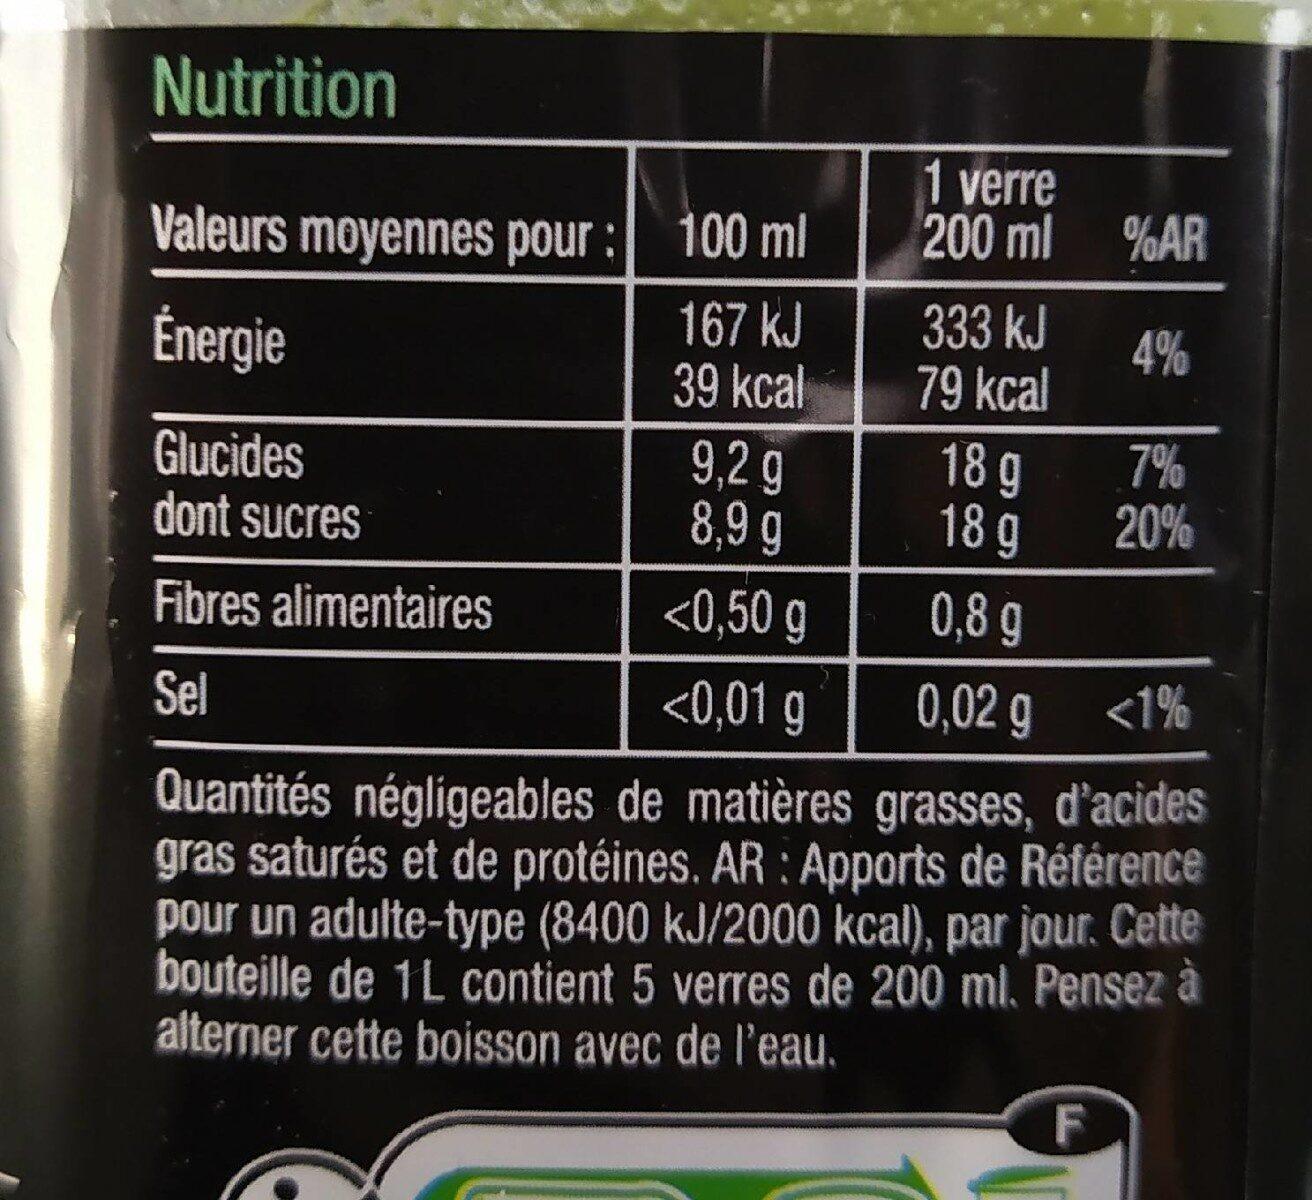 Boisson aux jus de fruits Pomme Kiwi - Valori nutrizionali - fr